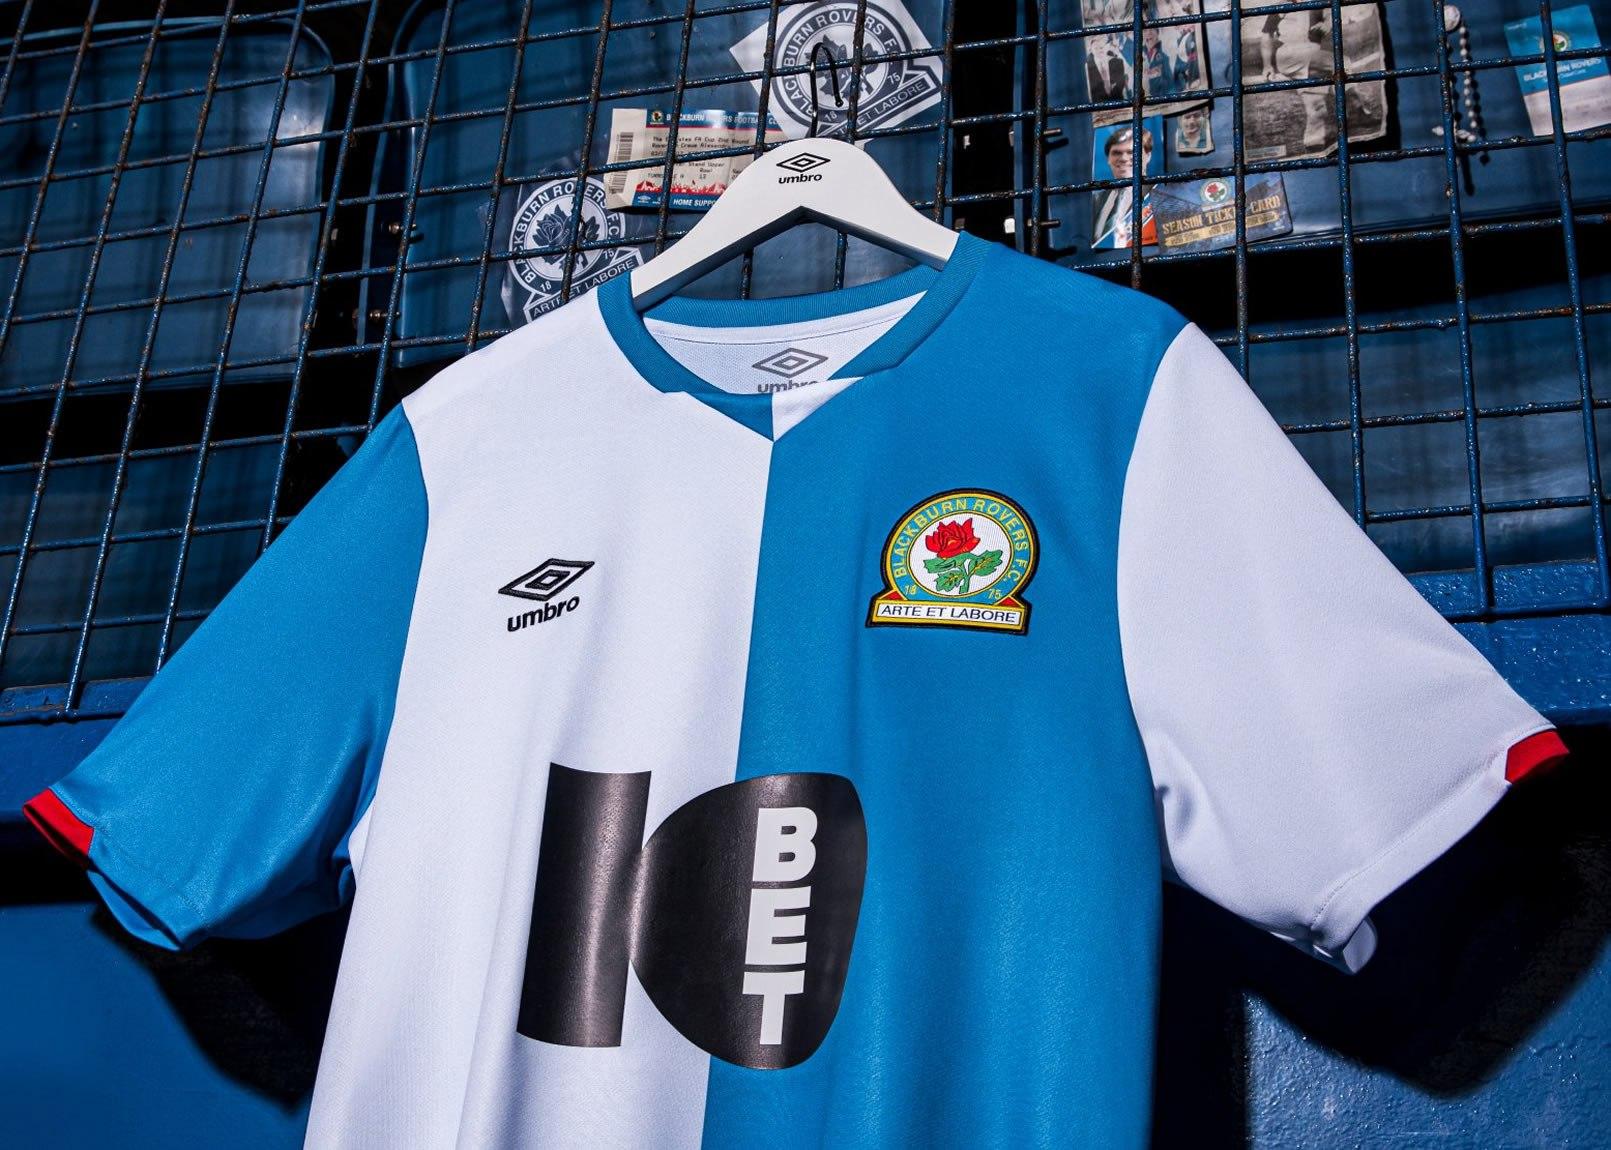 Camiseta Umbro del Blackburn Rovers 2019/20 | Imagen Web Oficial